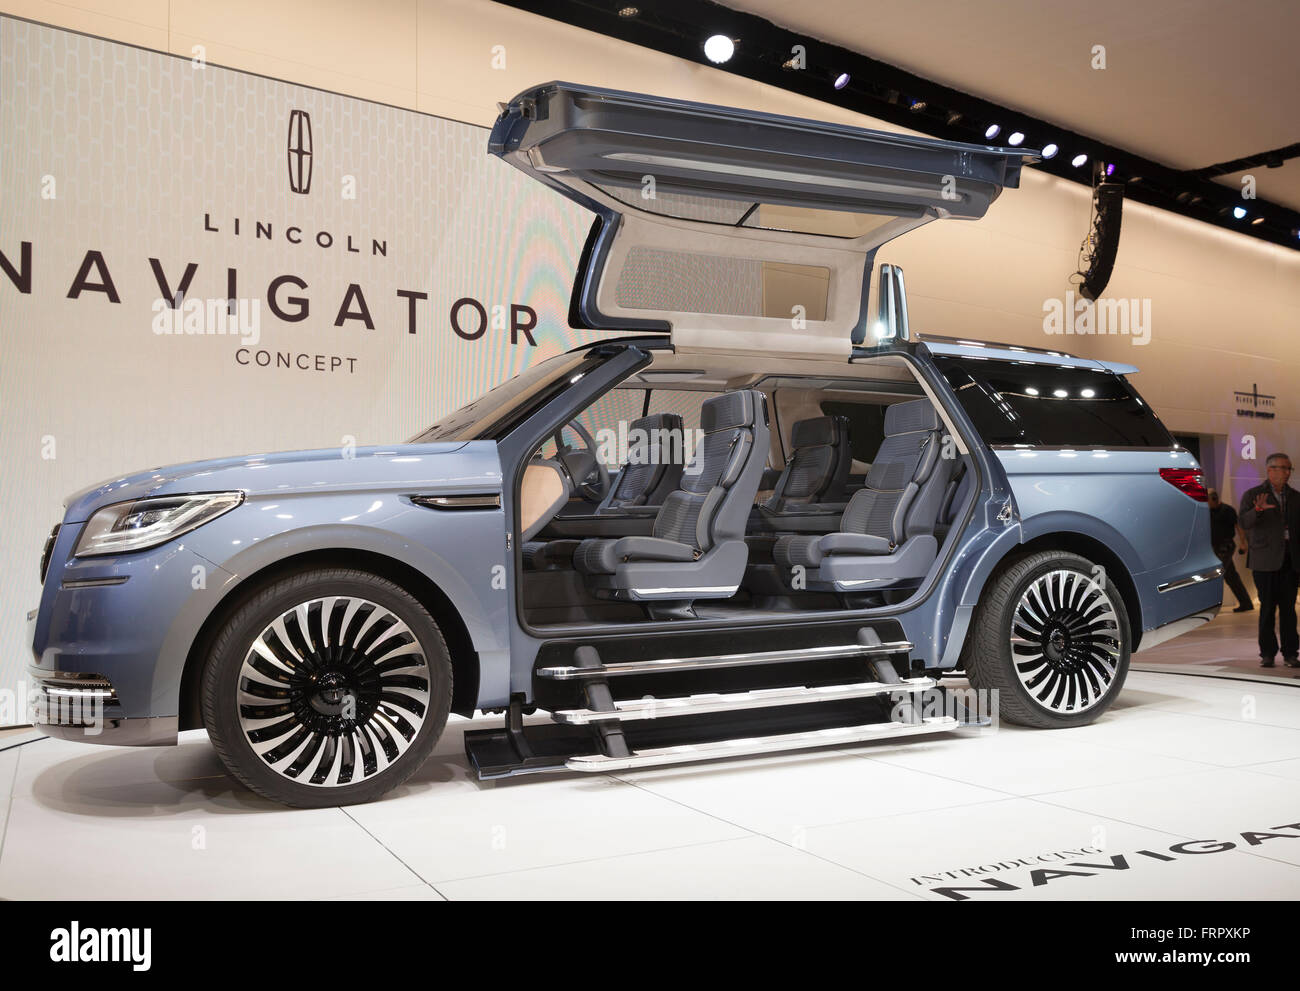 https://c8.alamy.com/comp/FRPXKP/new-york-usa-23rd-march-2016-lincoln-navigator-concept-car-on-display-FRPXKP.jpg